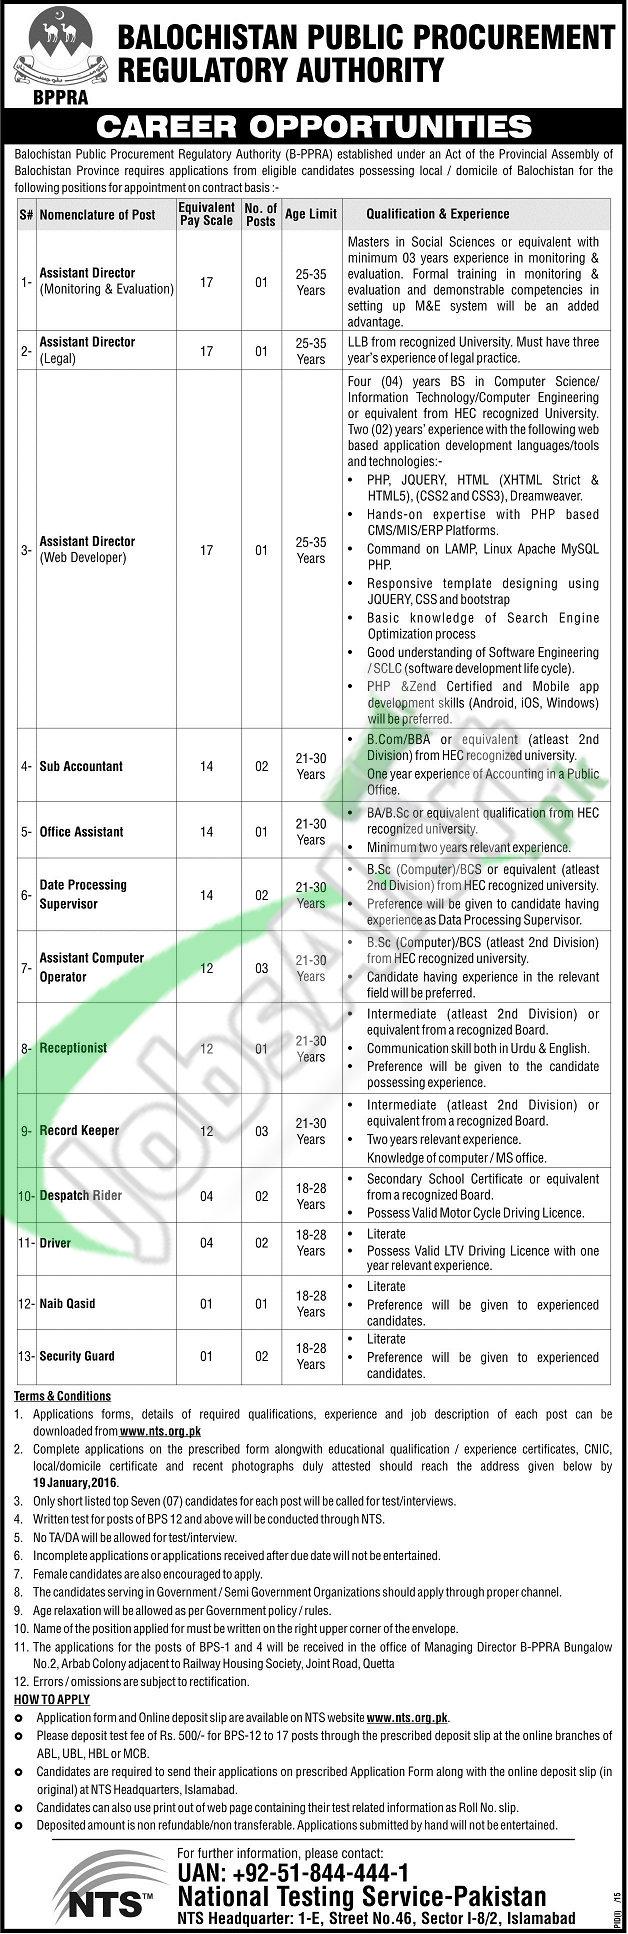 Career Opportunities in Balochistan Public Procurement Regularity Authority for Assistant Director 2016